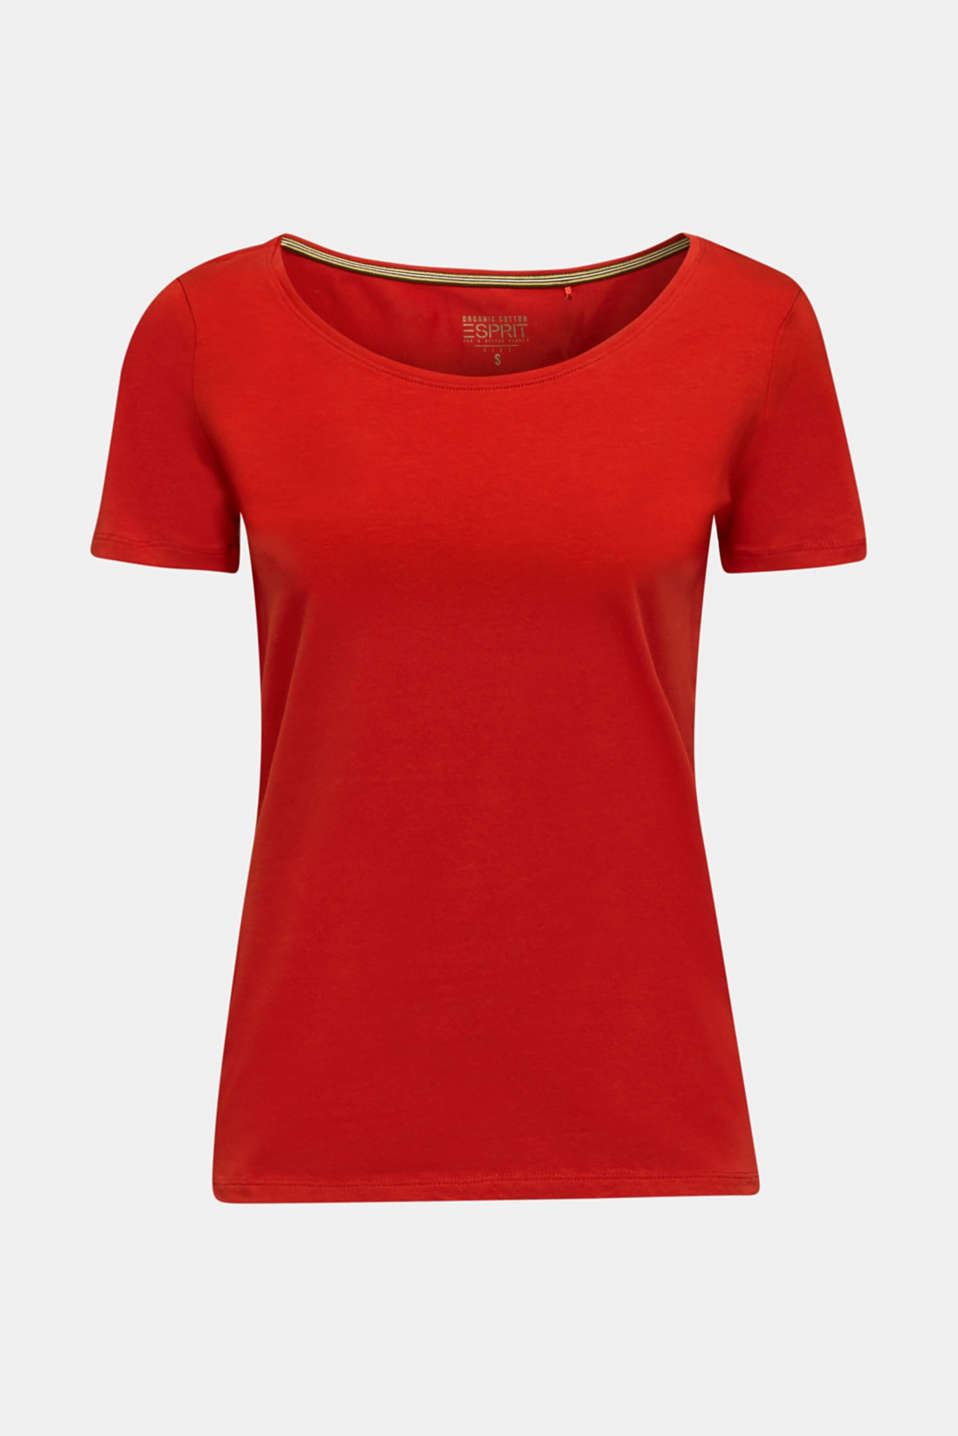 T-Shirts, DARK RED 3, detail image number 4